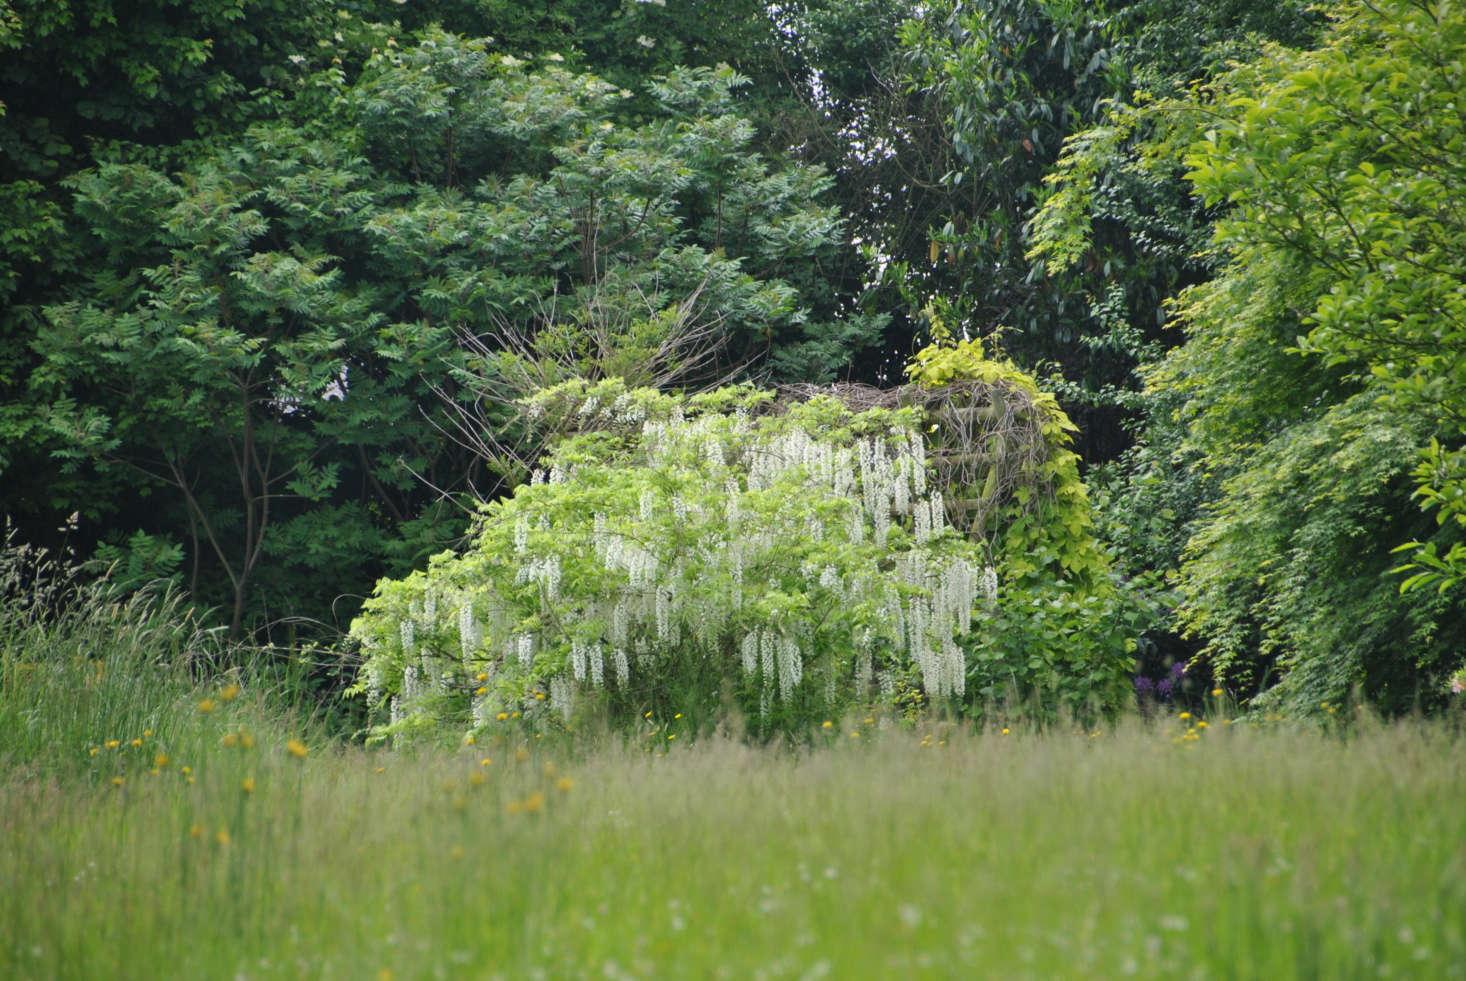 White wisteria. Photograph by Jean Jones via Flickr.